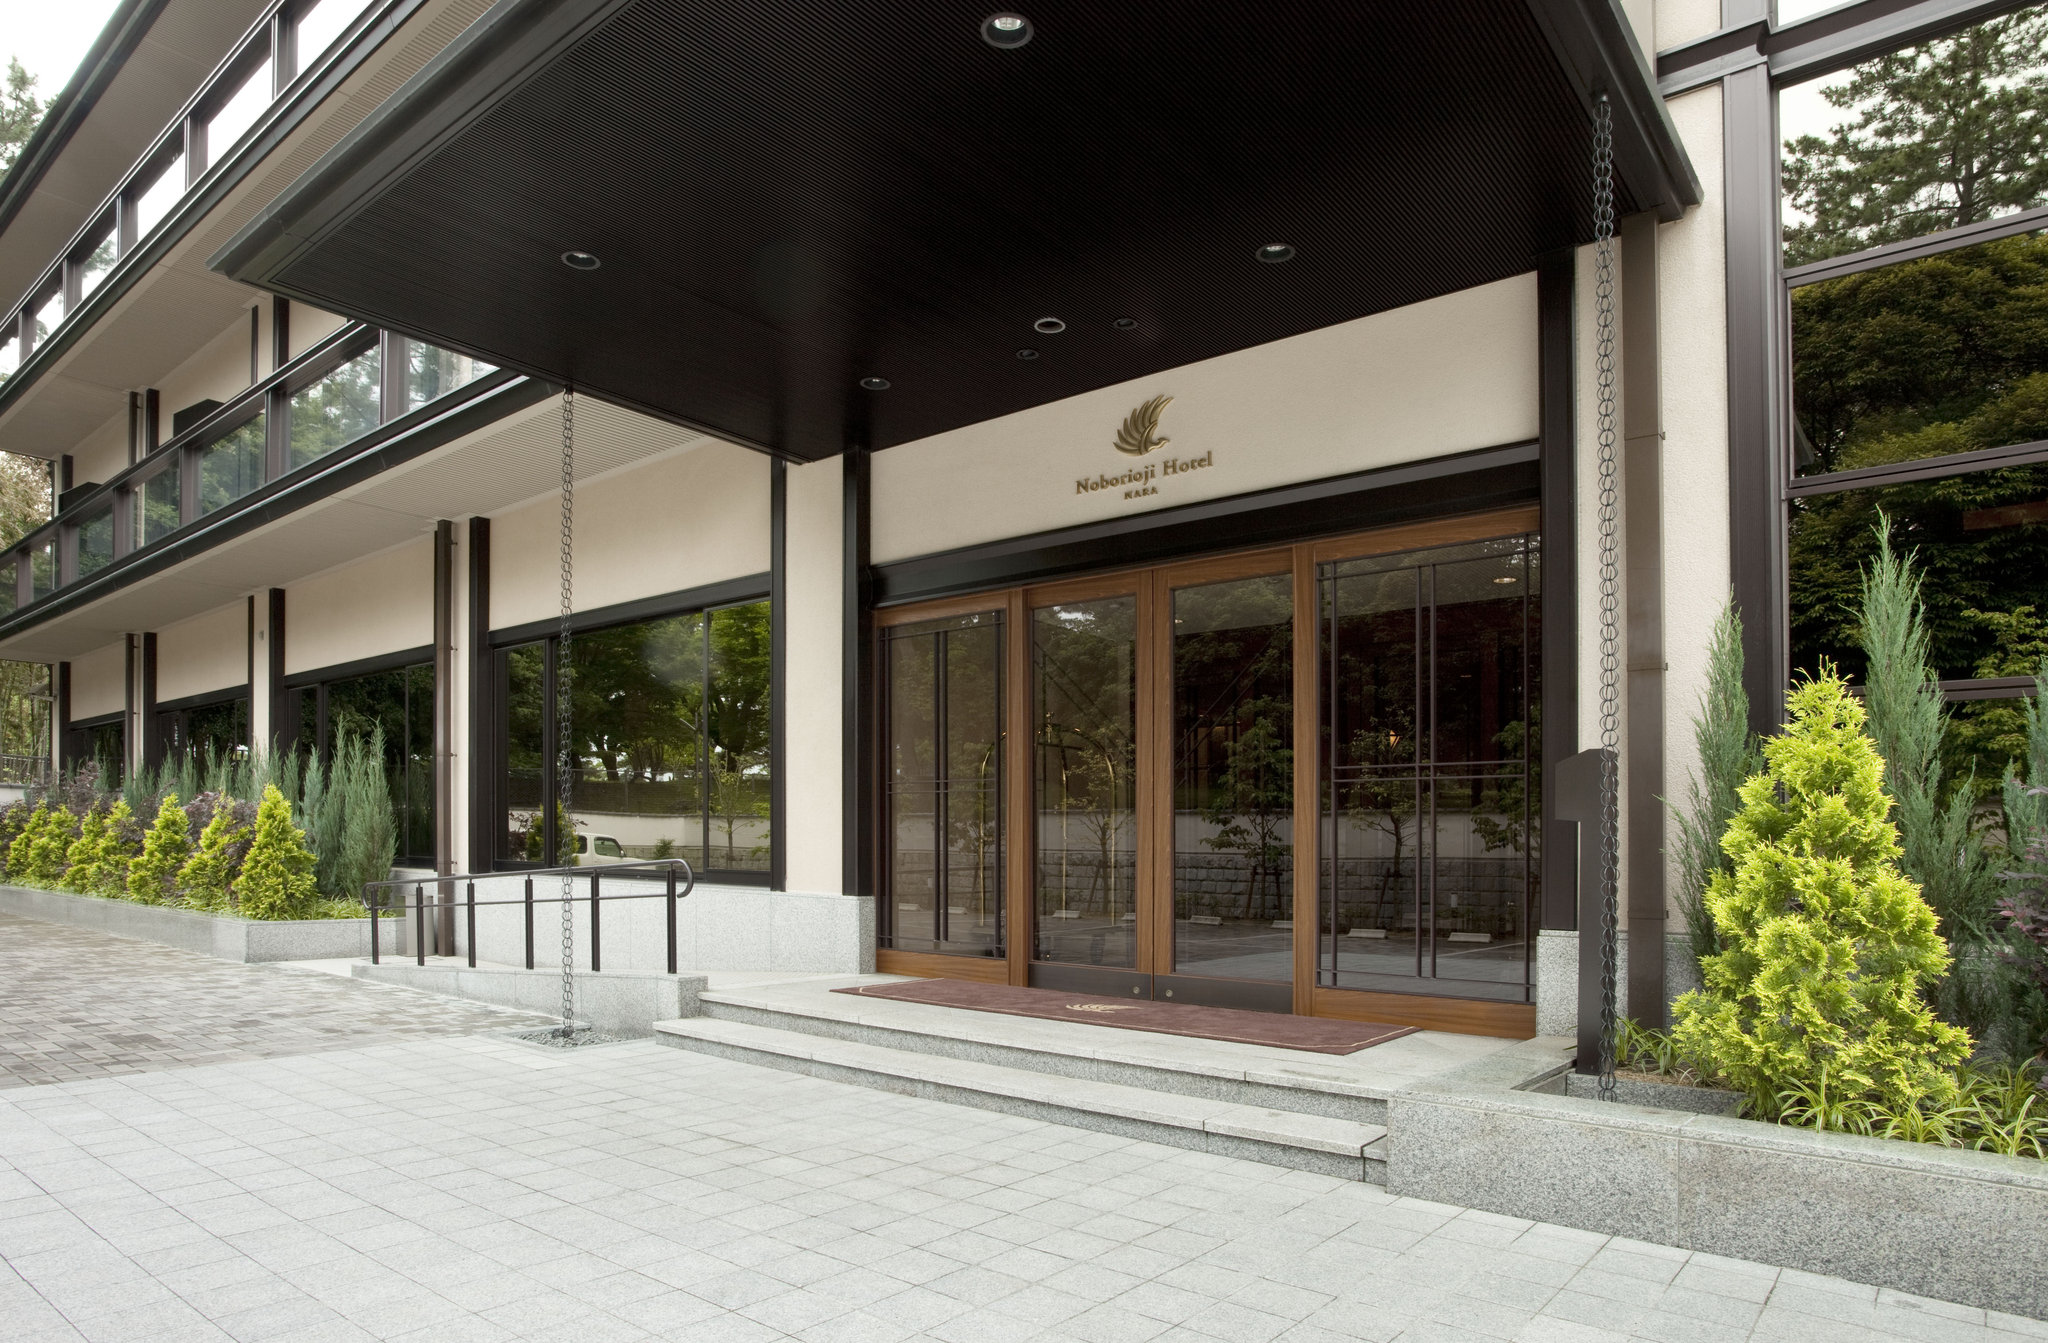 Noborioji Hotel